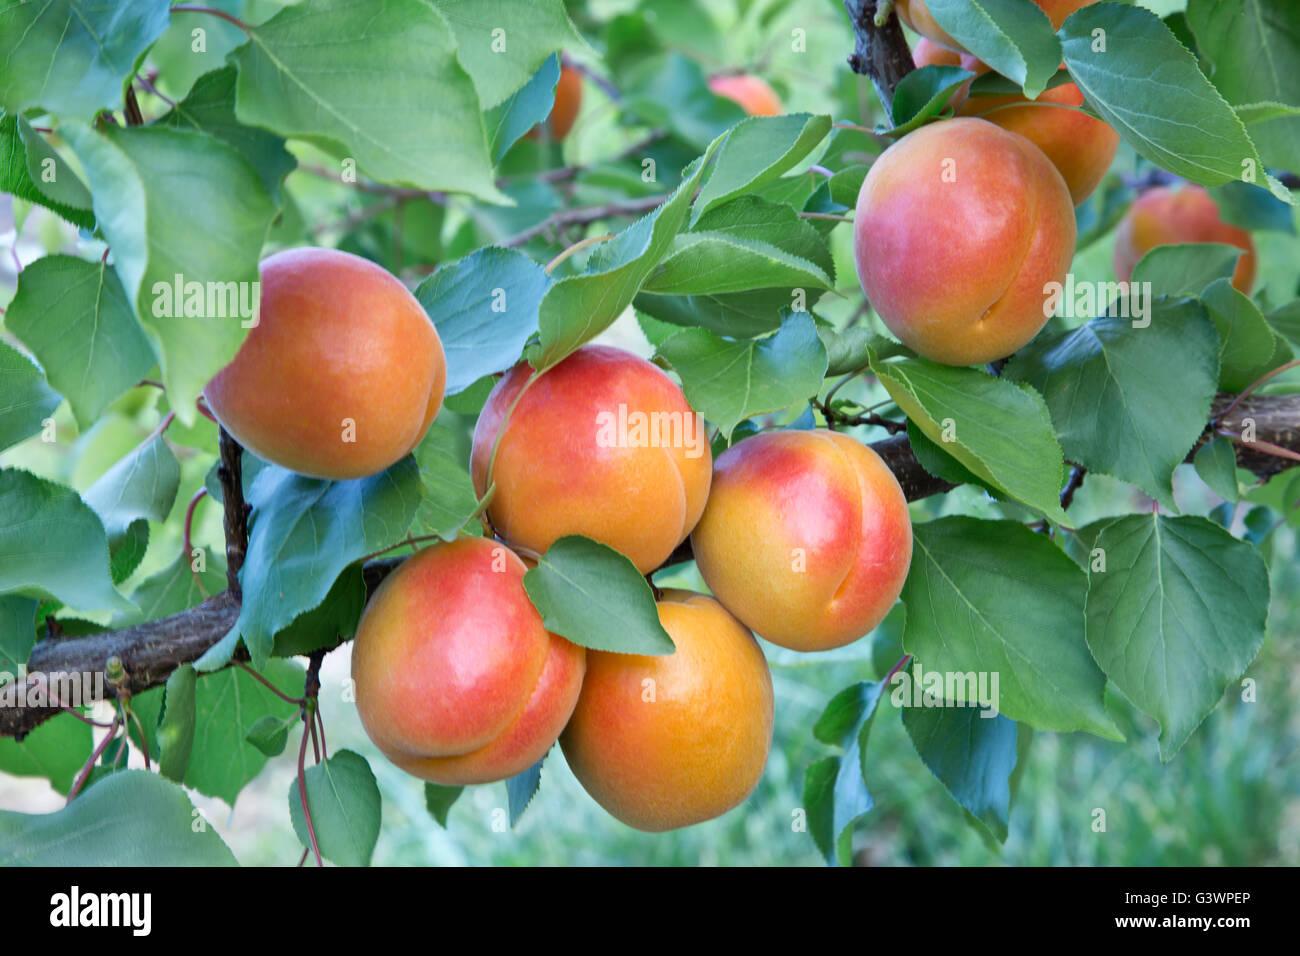 Apricots 'Robada' variety maturing on branch, Prunus armeniaca' - Stock Image